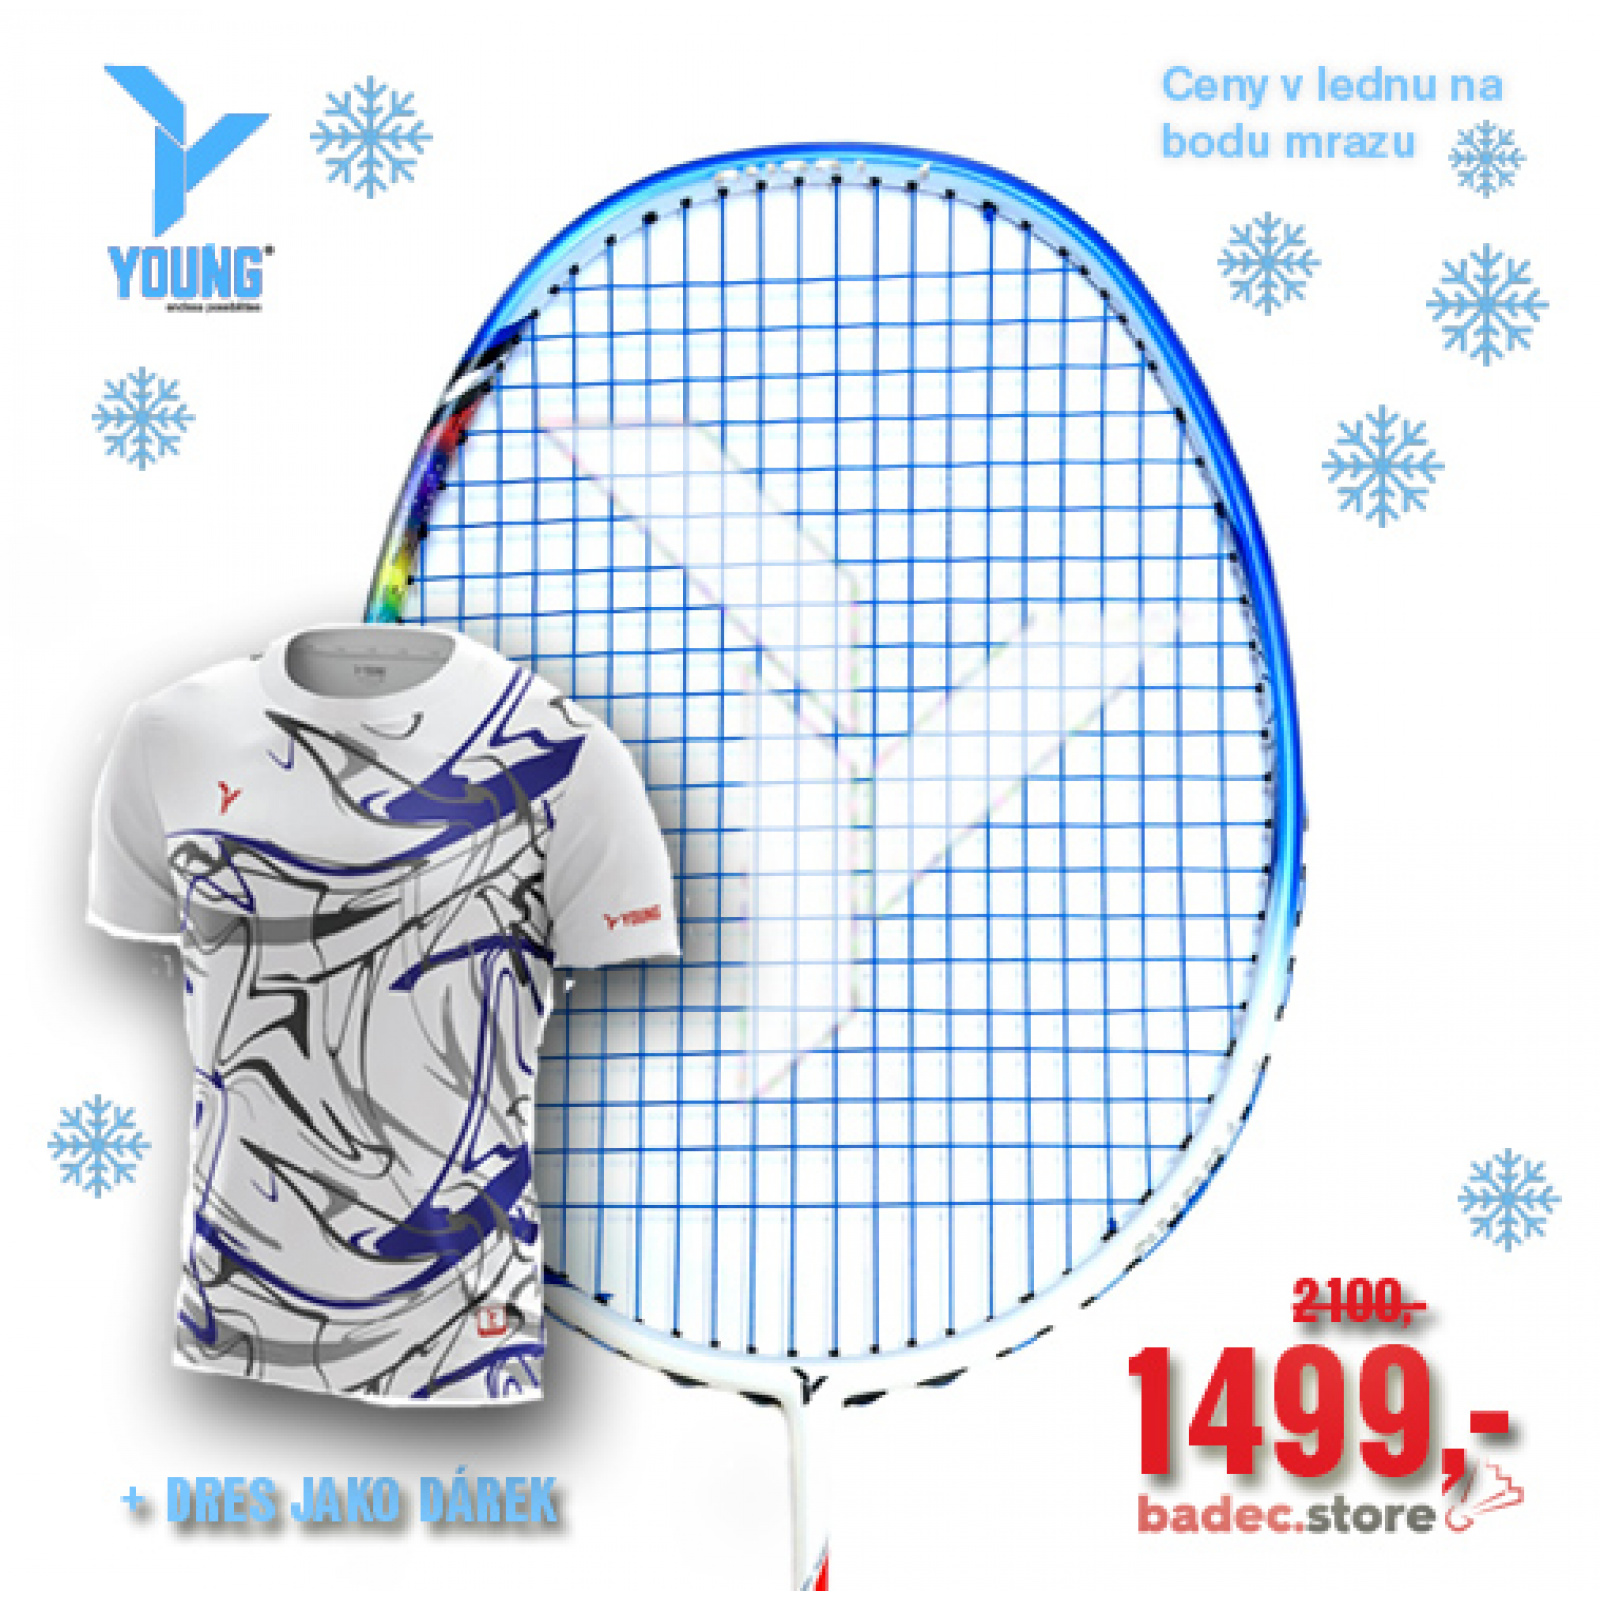 https://www.badec.store/produkty_img/badmintonova-raketa1579208304L.jpg